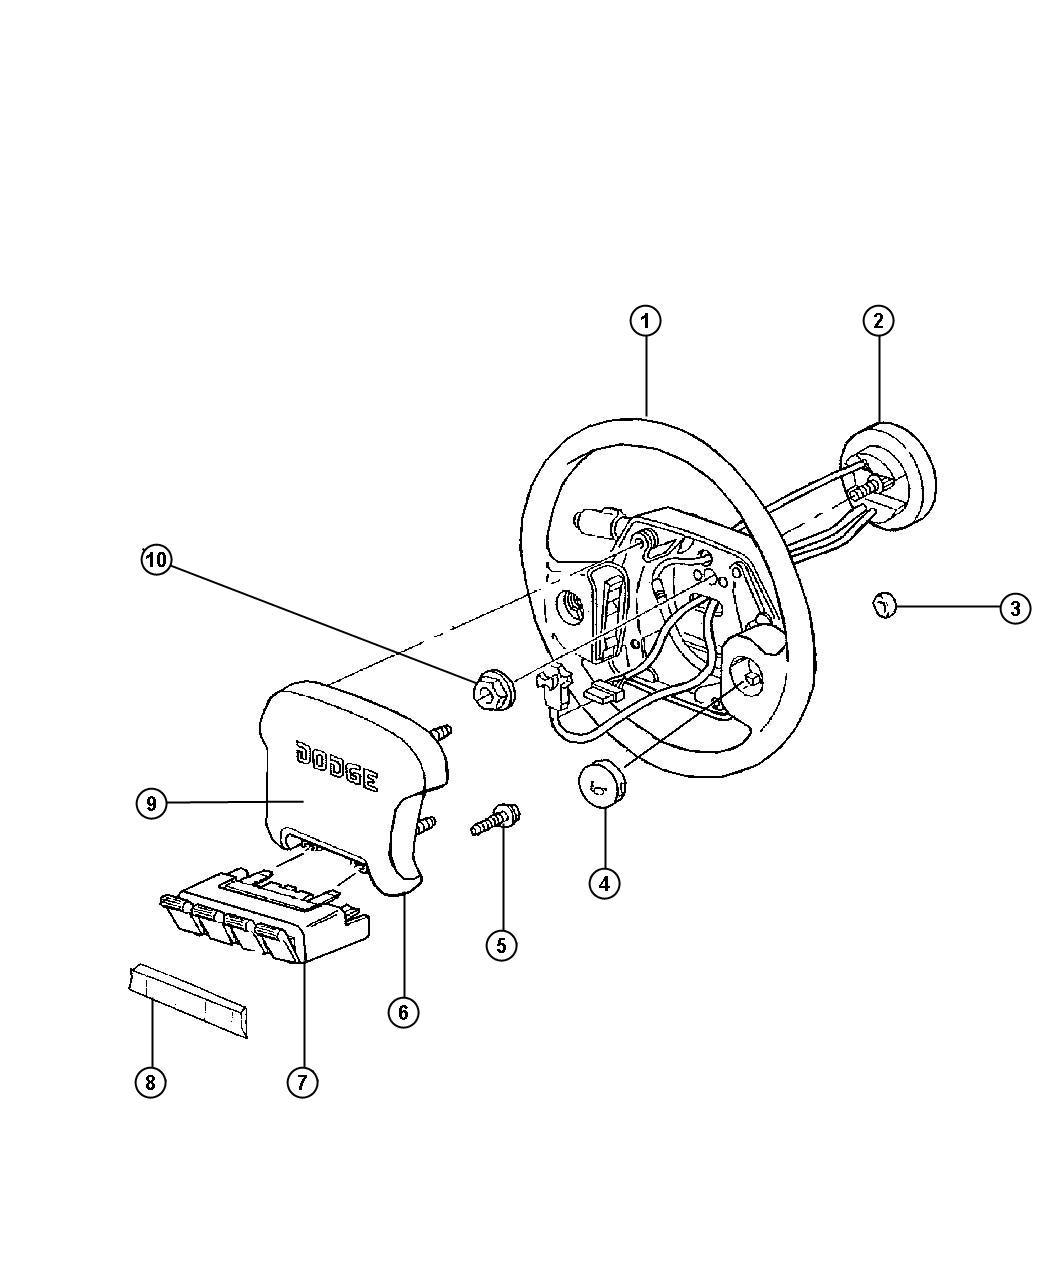 1997 Dodge Ram 1500 Steering Diagram Best Secret Wiring Wheel 1990 W150 Power Hose